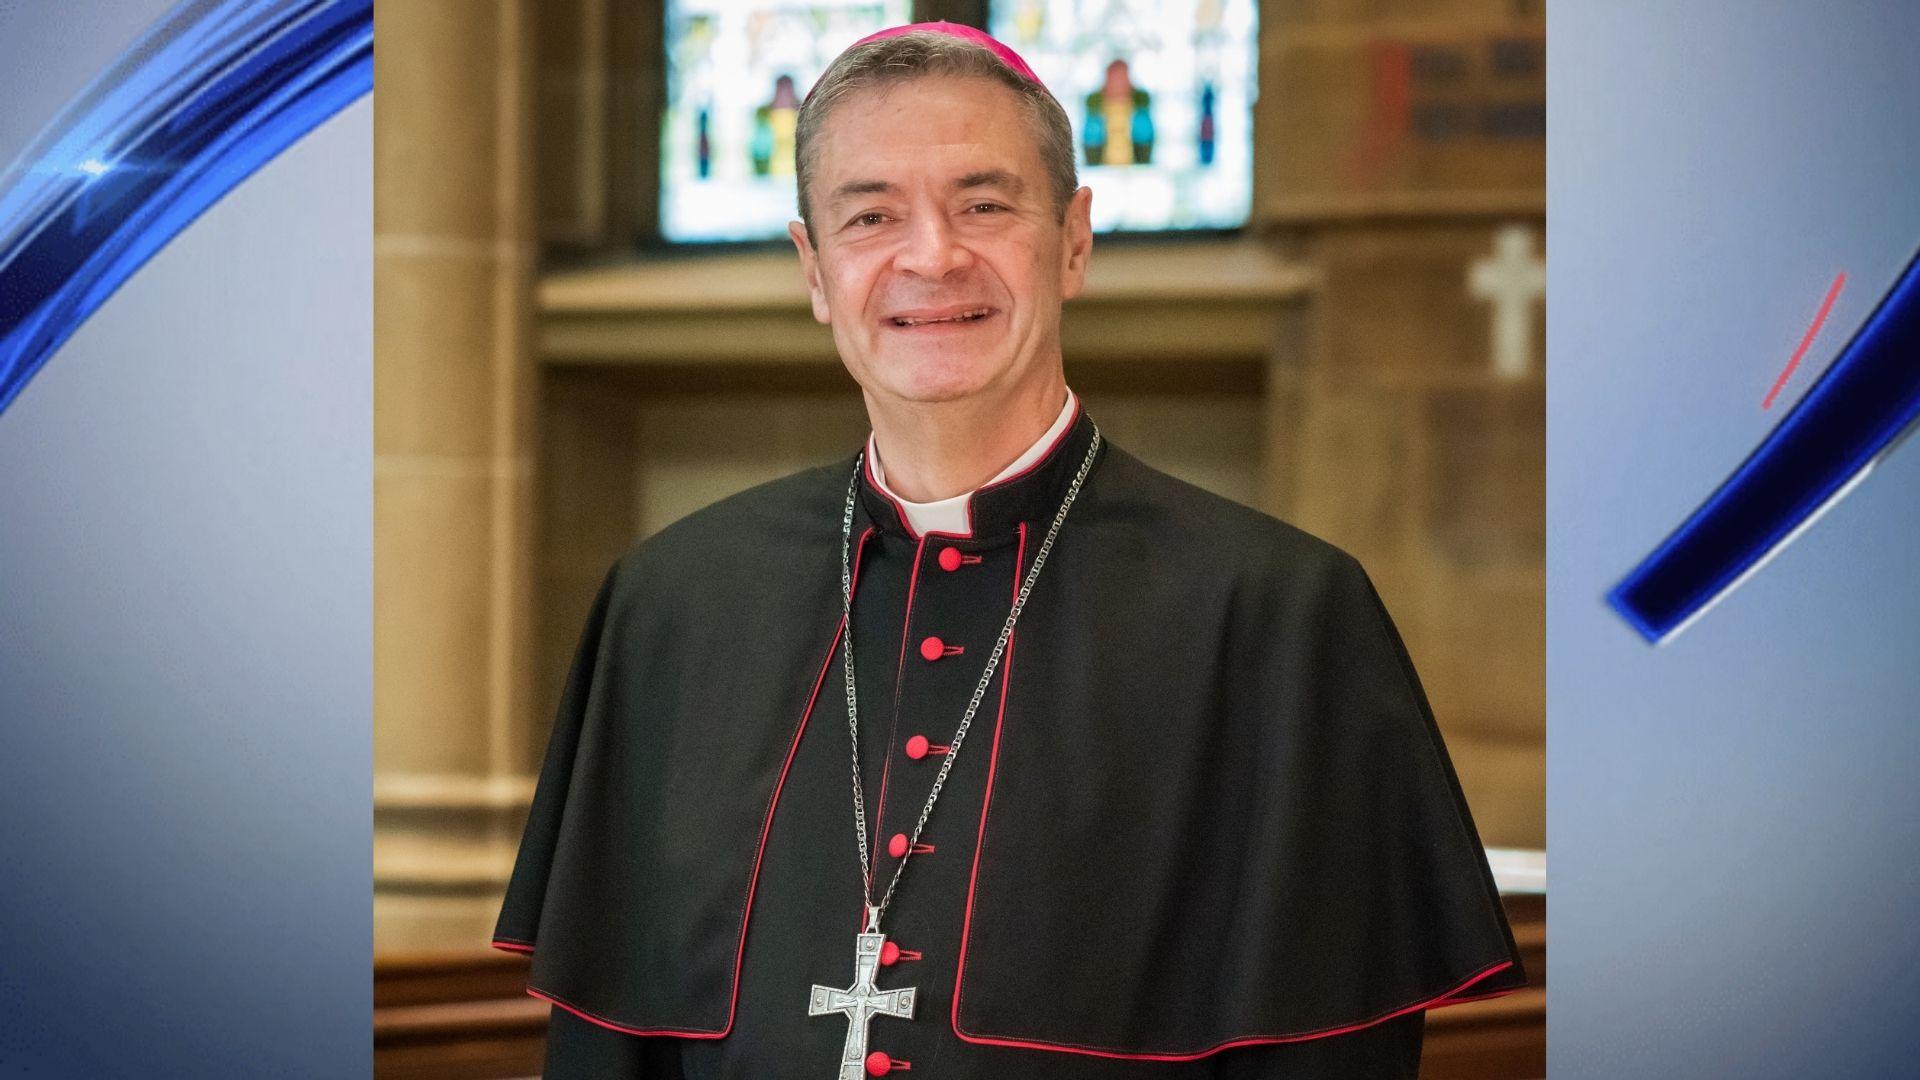 Bishop Robert Brennan